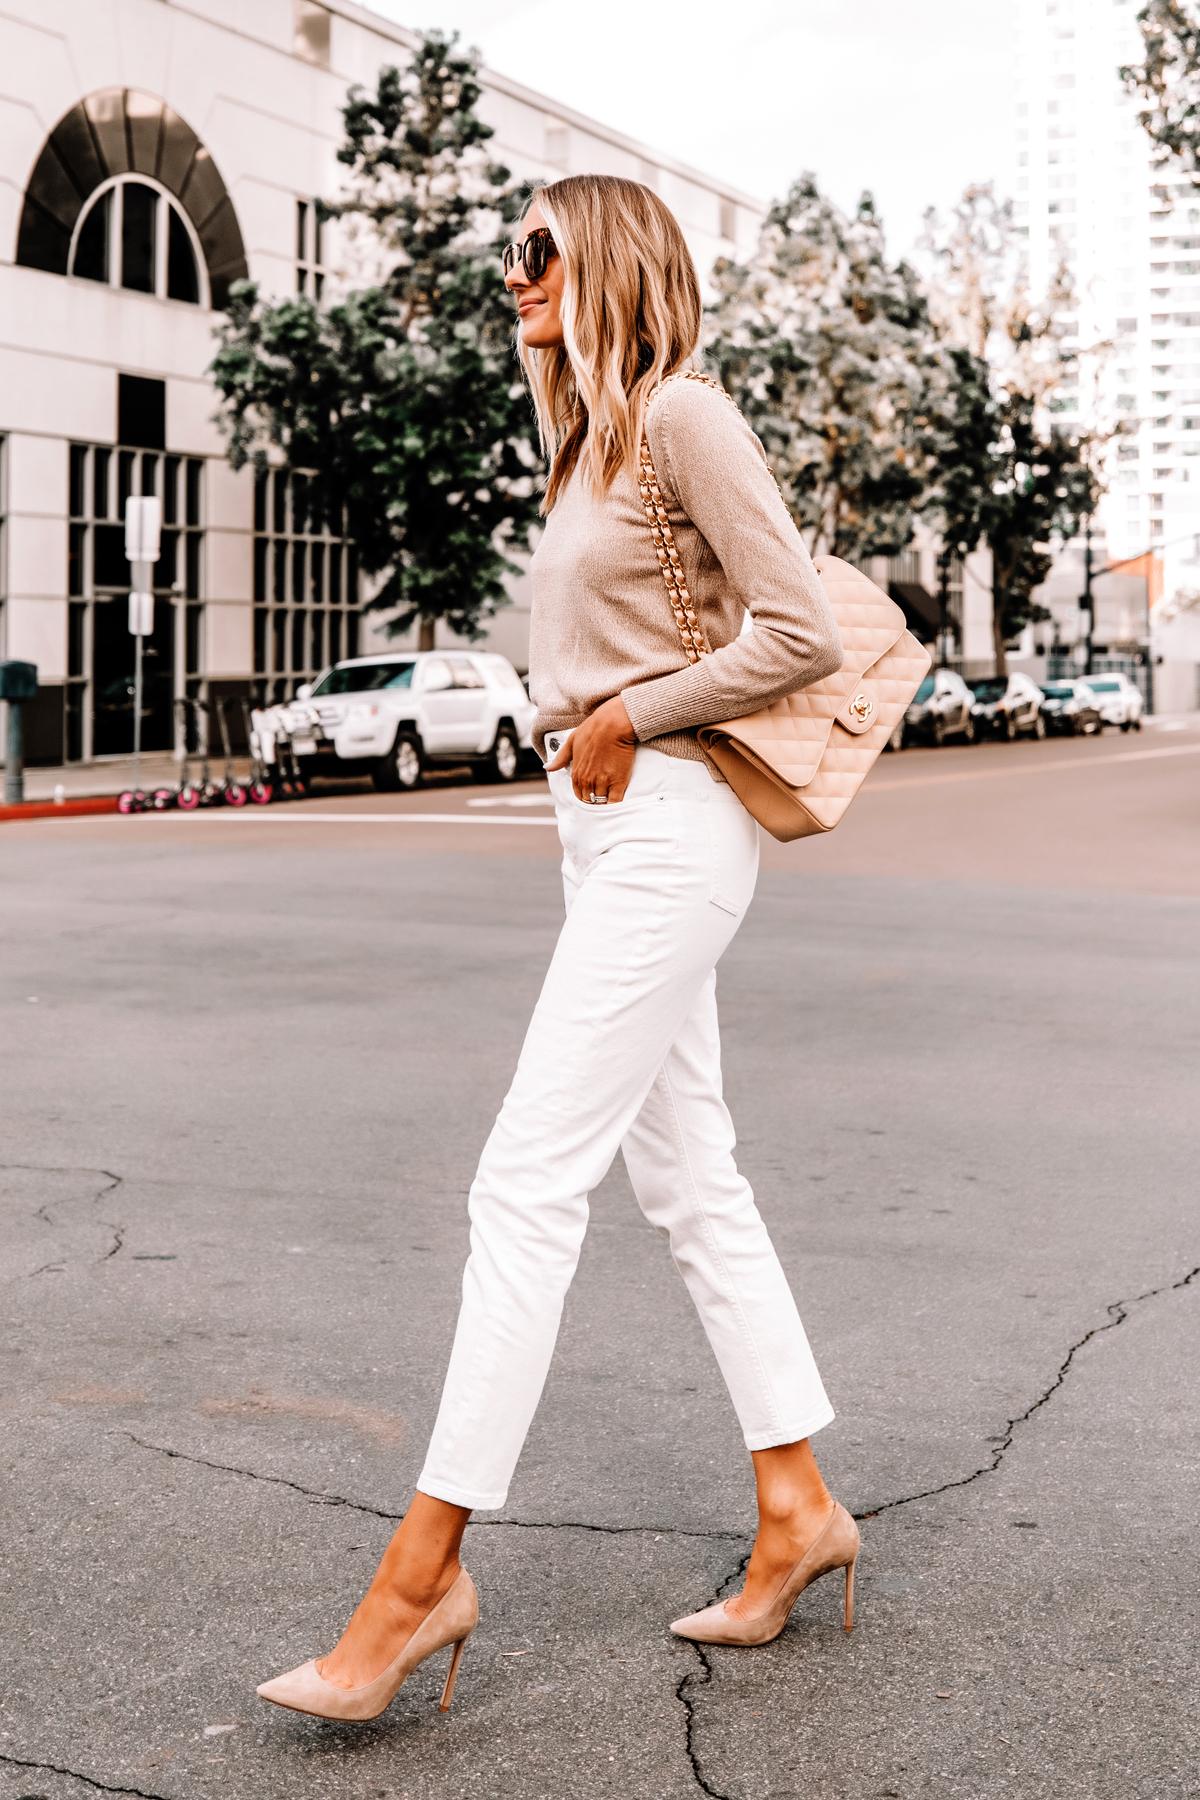 Fashion Jackson Wearing Everlane Beige Sweater Everlane White Jeans Nude Pumps Beige Chanel Handbag